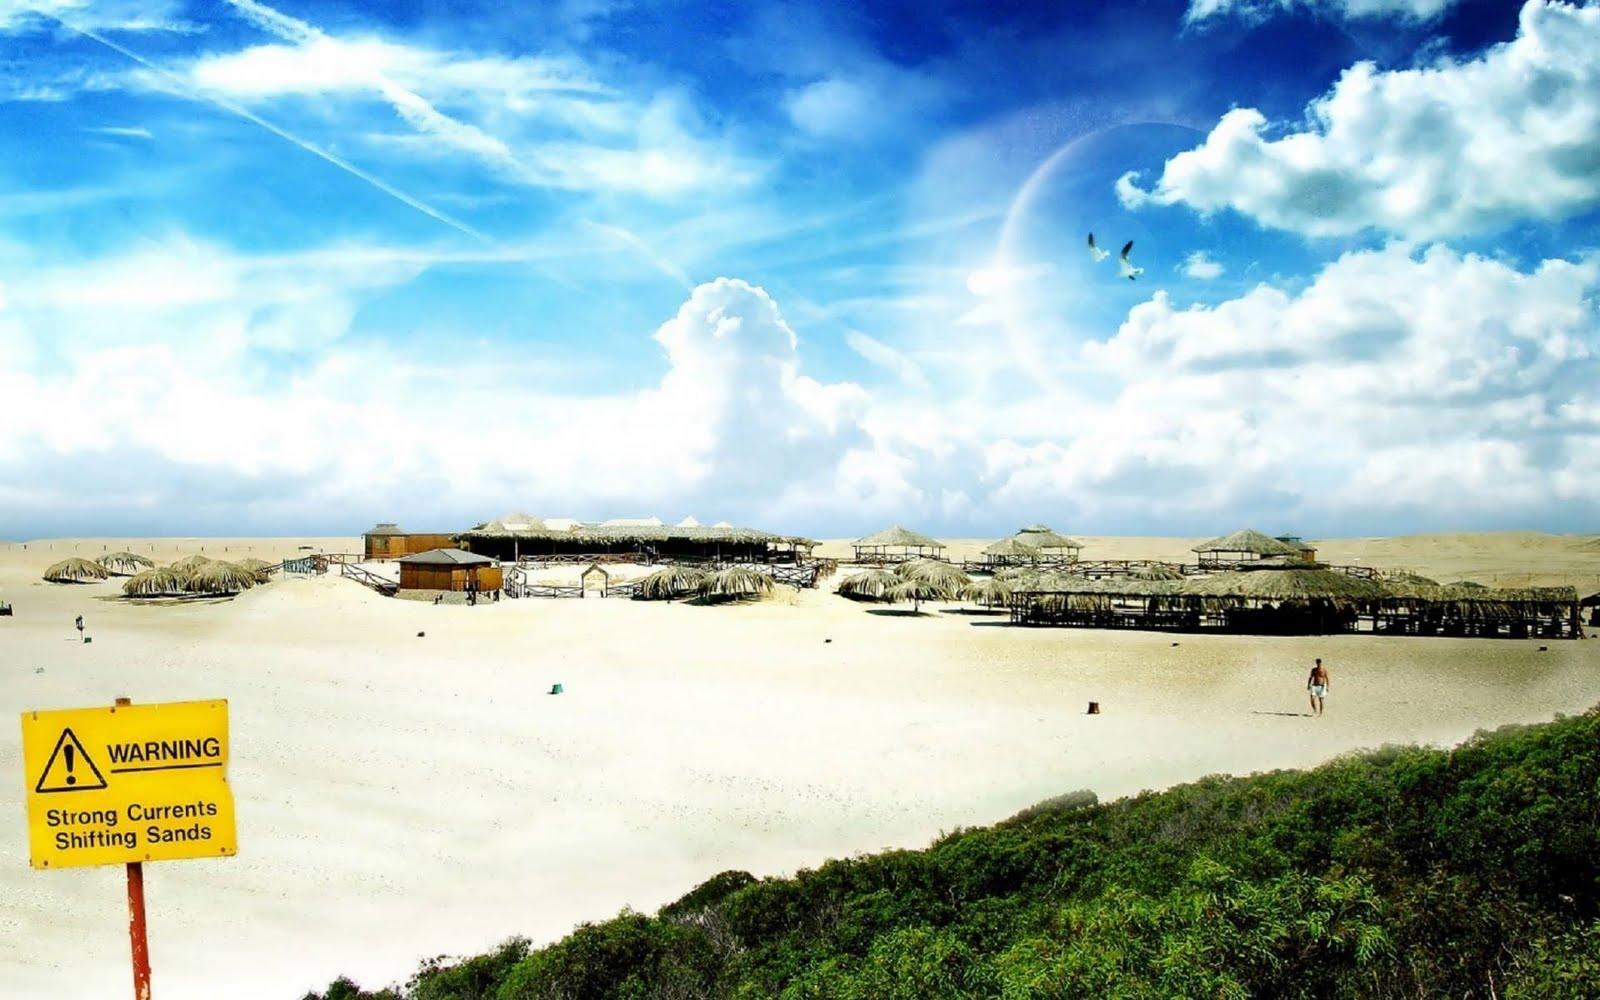 http://4.bp.blogspot.com/_KLJU3hHDGVM/THSMuYa82OI/AAAAAAAADtE/CQC-Uso9AfA/s1600/Dream_sea_beach_wallpeprs.jpg